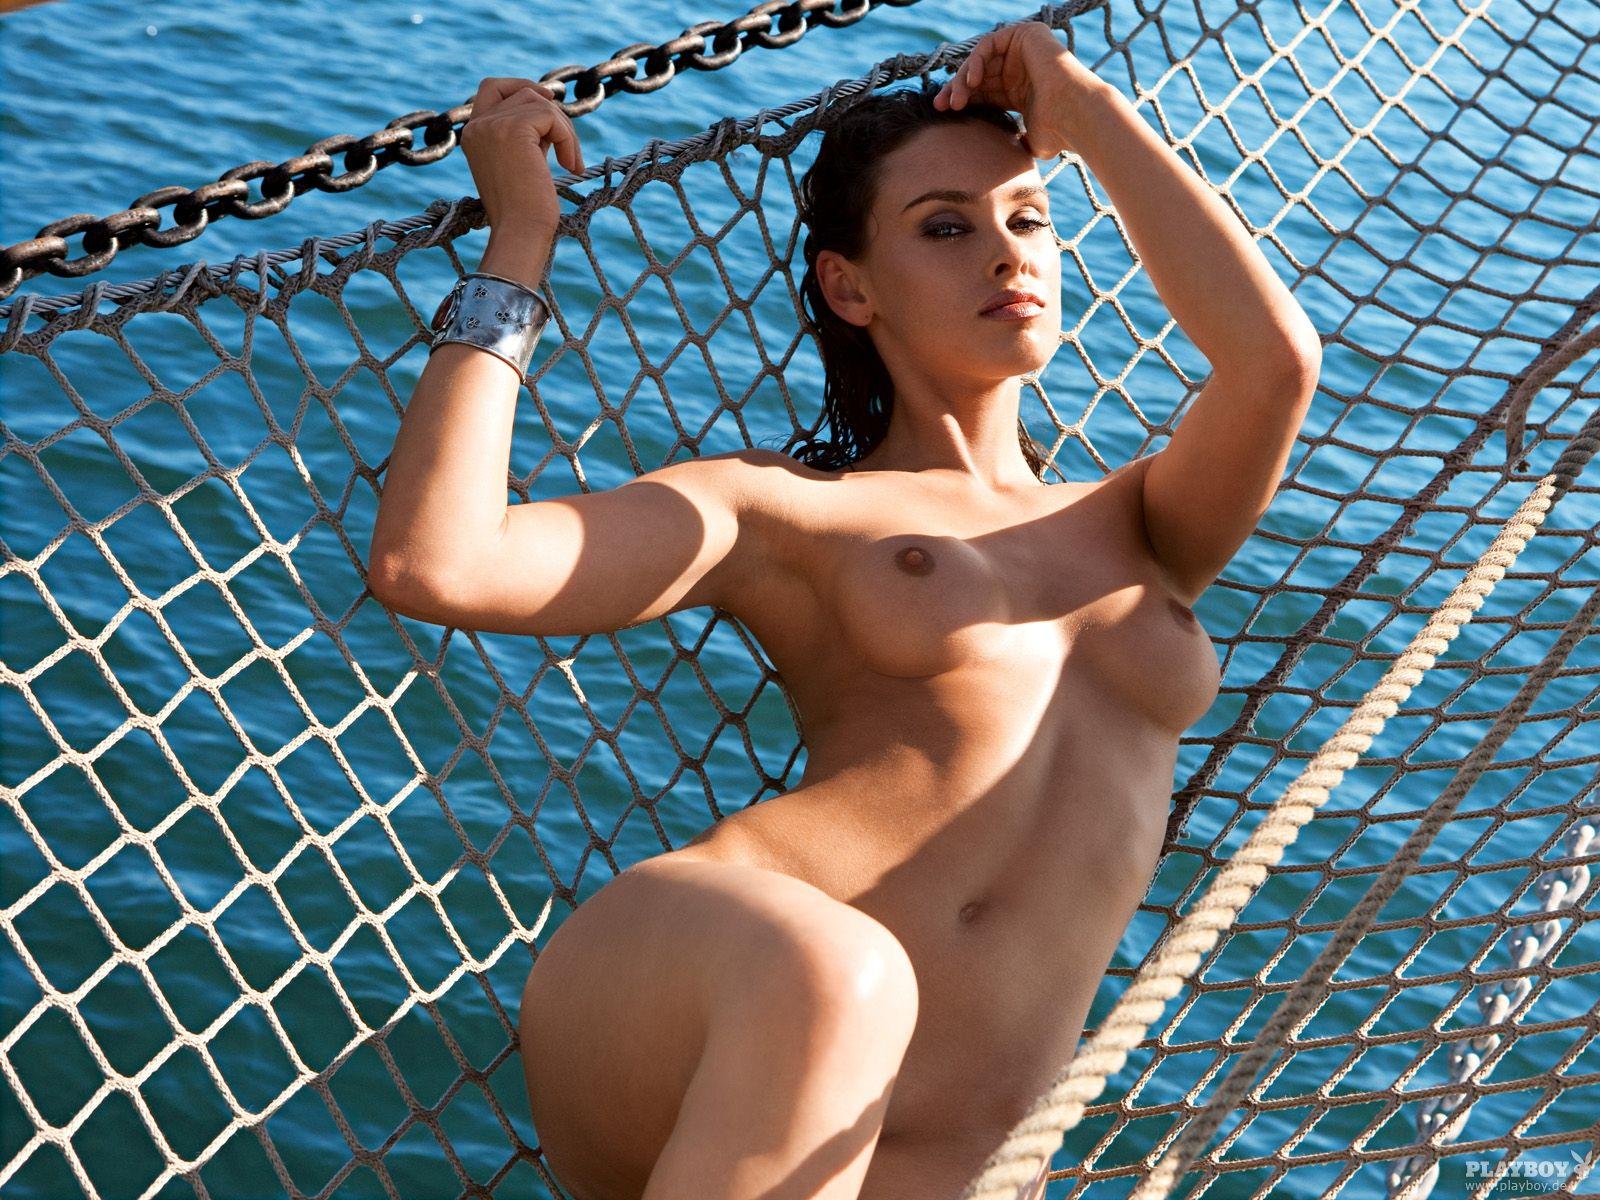 XXX Miriam Rathmann nude (44 photos), Tits, Cleavage, Feet, swimsuit 2006